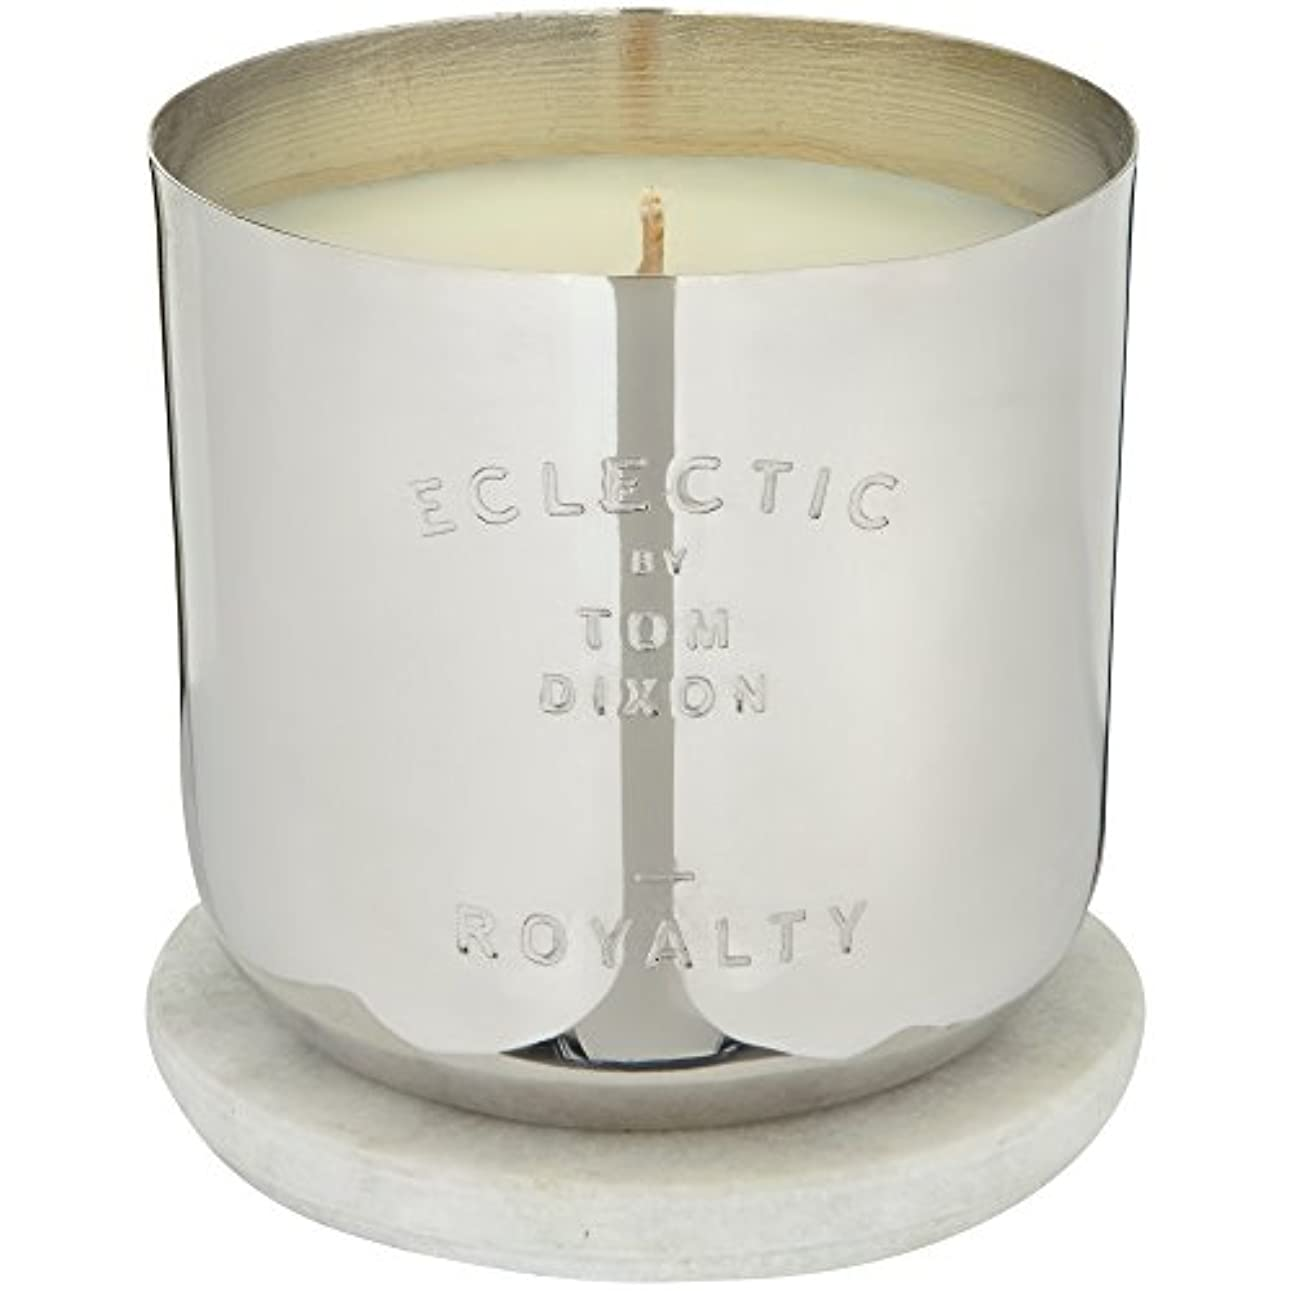 Tom Dixon Royalty Scented Candle (Pack of 2) - トム?ディクソンロイヤリティ香りのキャンドル x2 [並行輸入品]